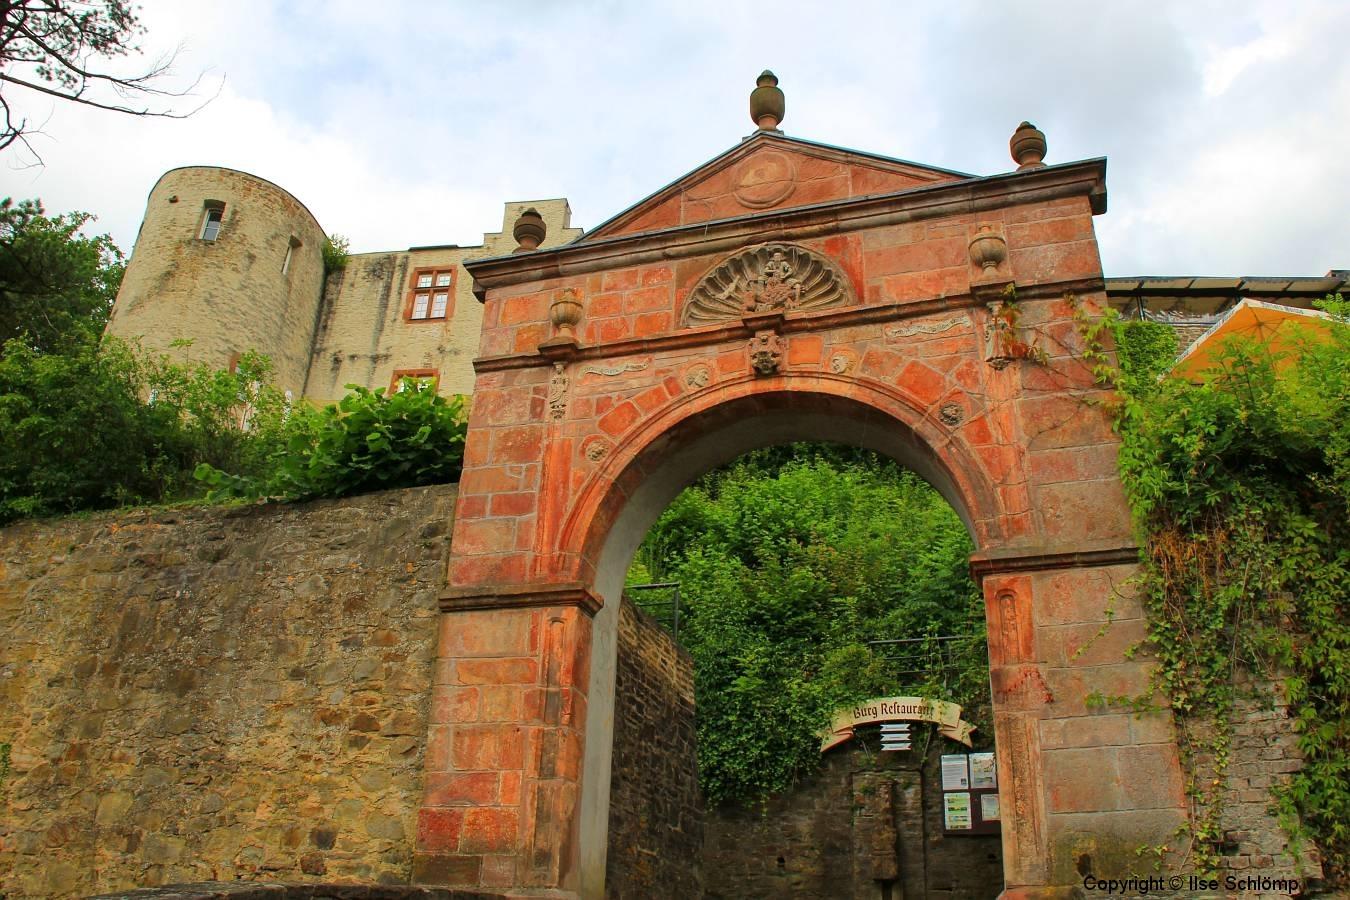 Burg Münstereifel, Bad Münstereifel, Nordrhein-Westfalen